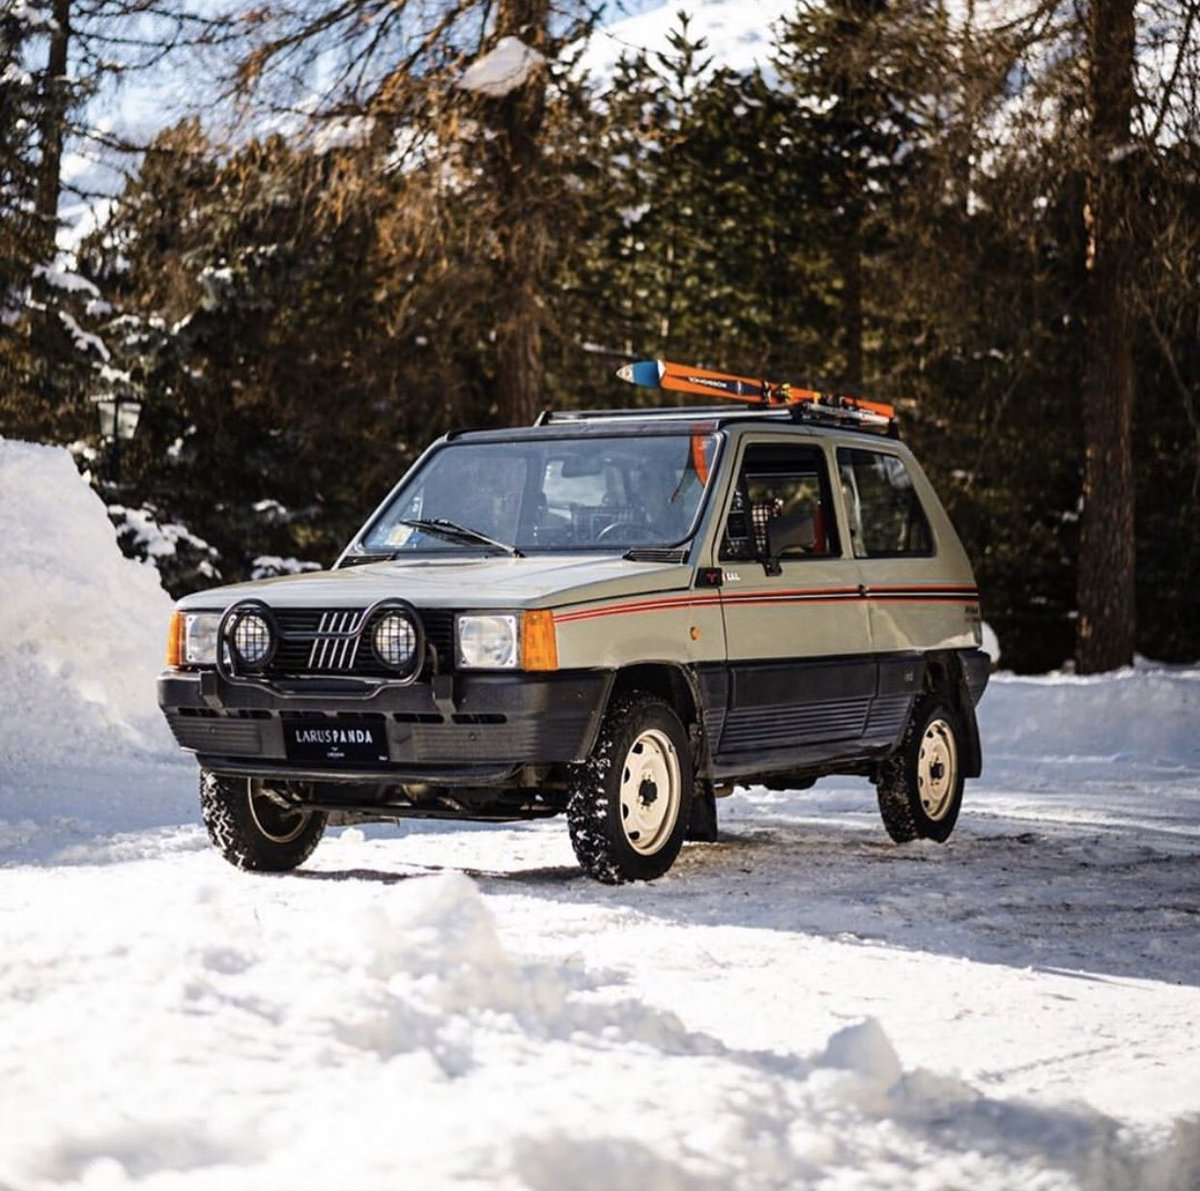 Keepin Classic On Twitter Keepinclassic Fiat Panda Fiatpanda Panda4x4 Classicfiat Retrofiat Modifiedfiat Fiatpanda4x4 Offroader Goeverywhere Fiatclassic Https T Co Wjagiv7hln